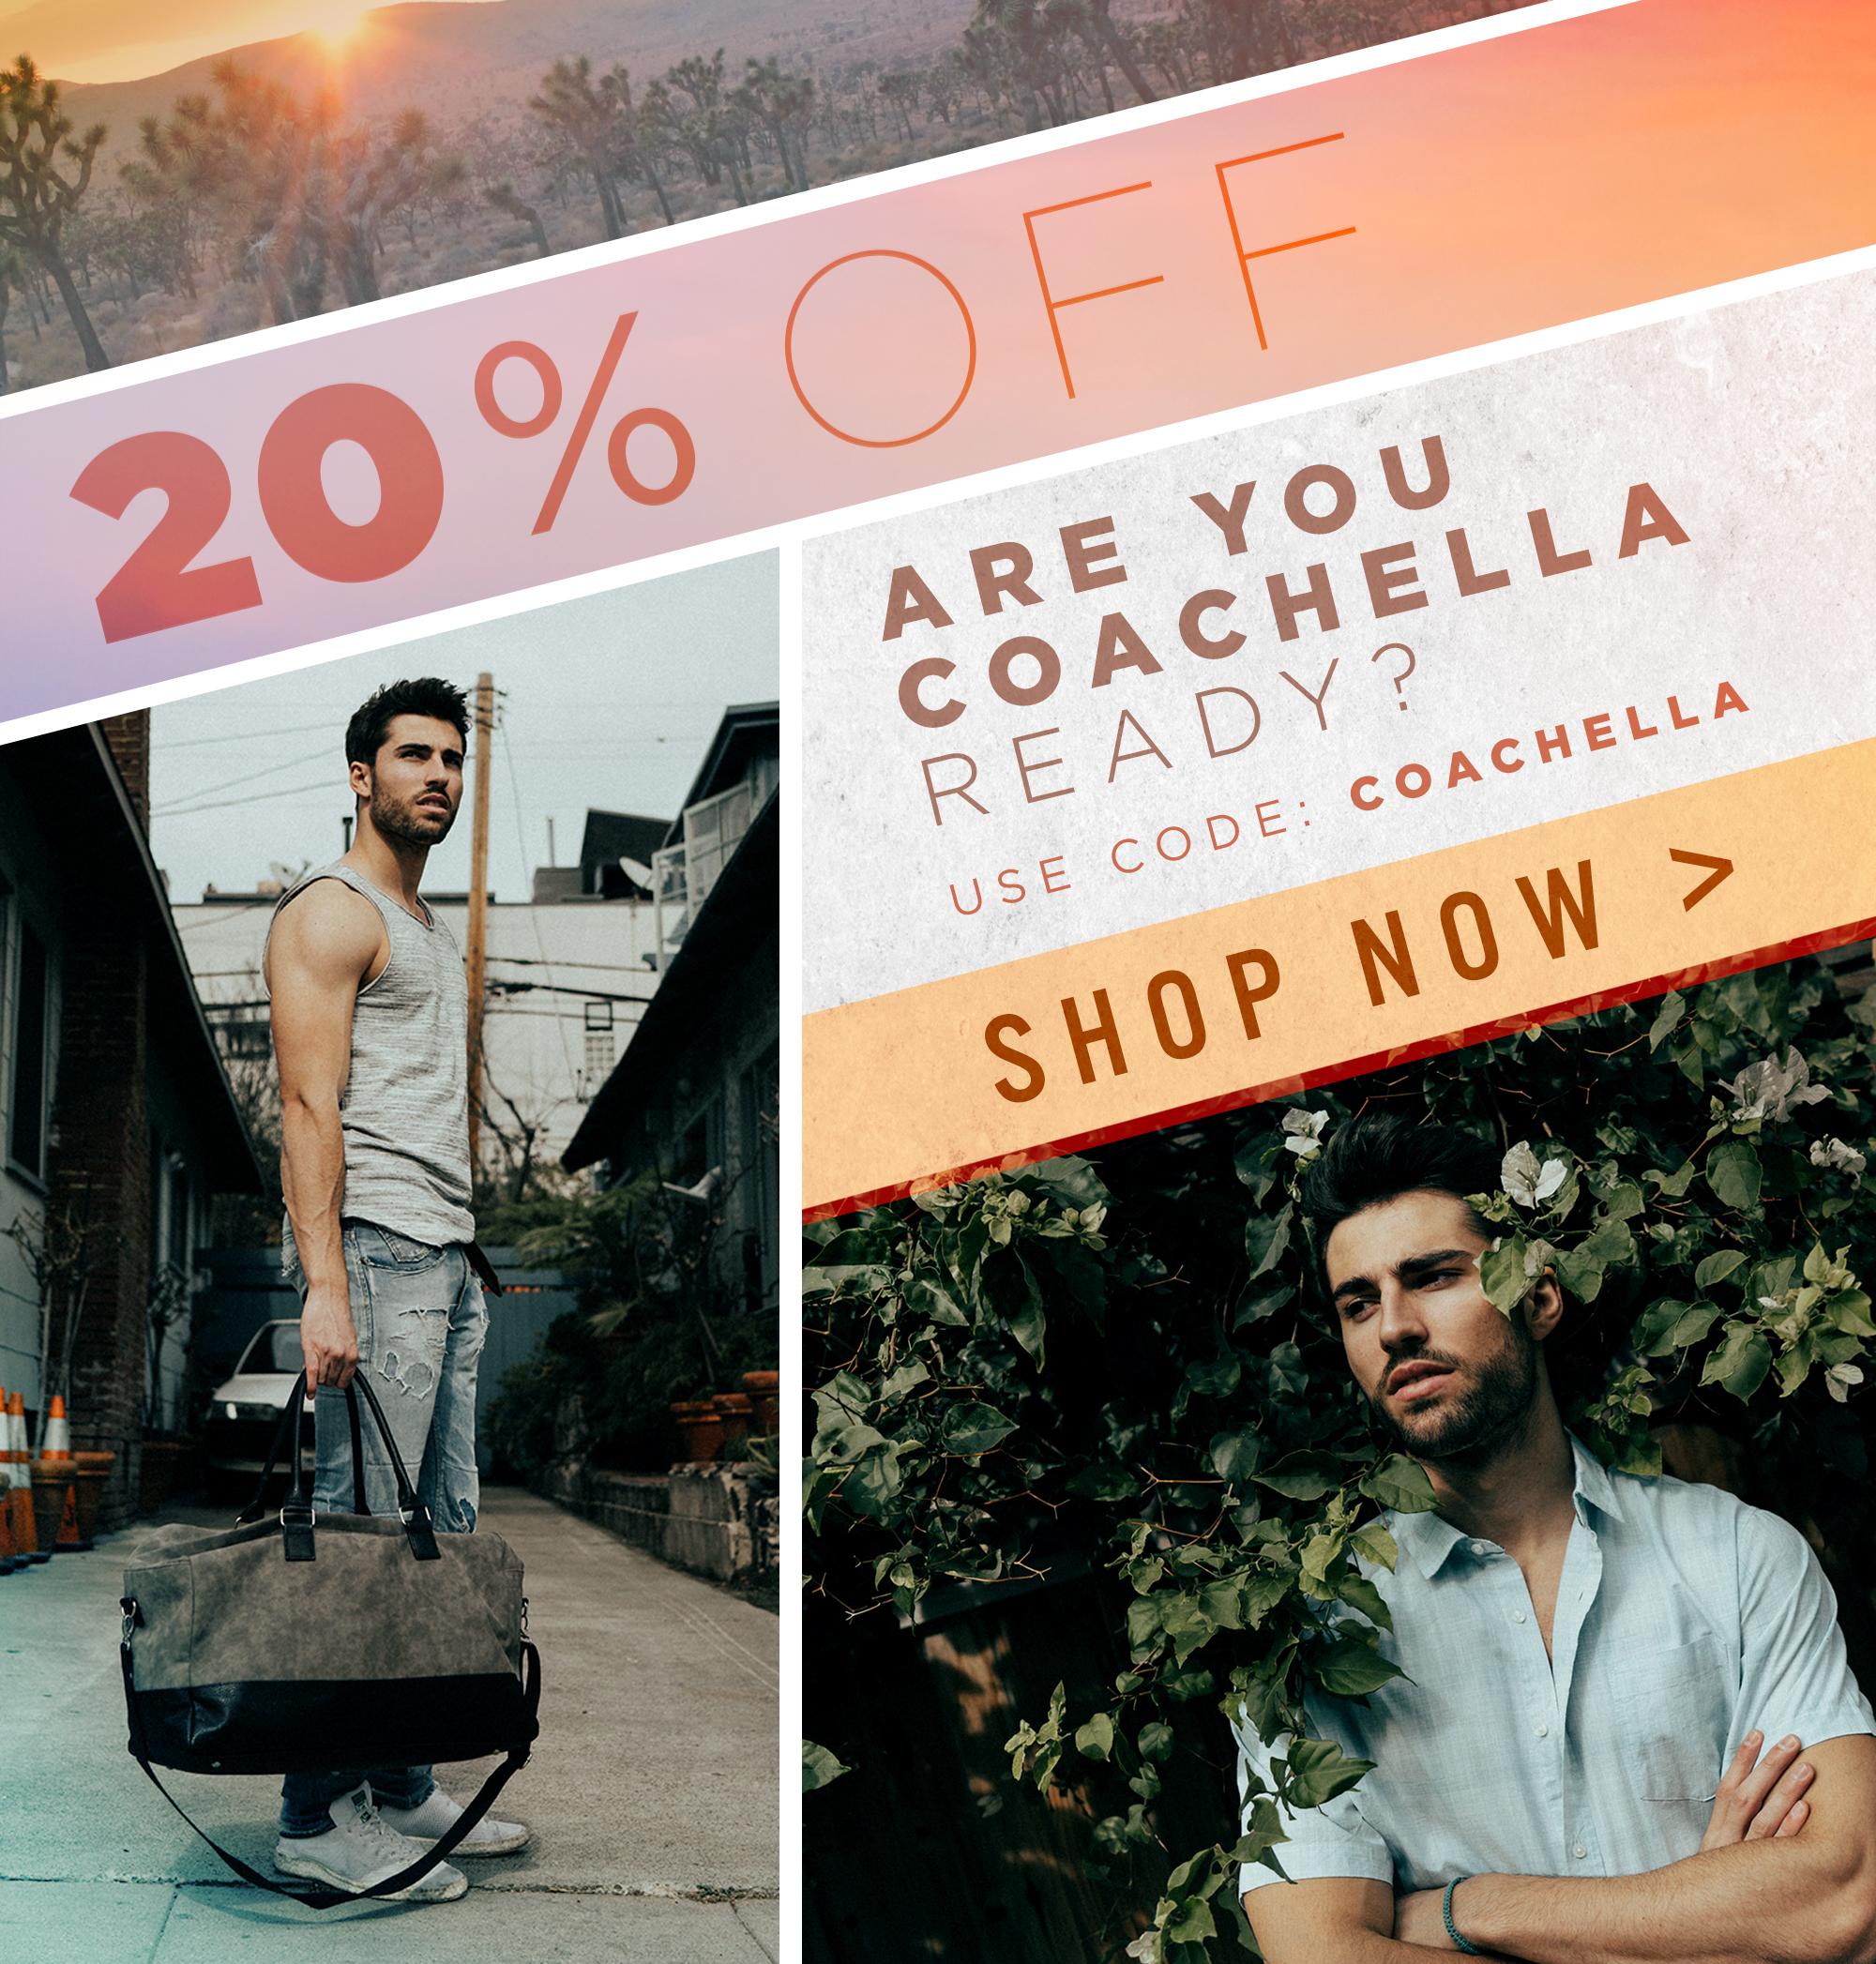 PX CLOTHING_COACHELLA READY_NEW2.jpg